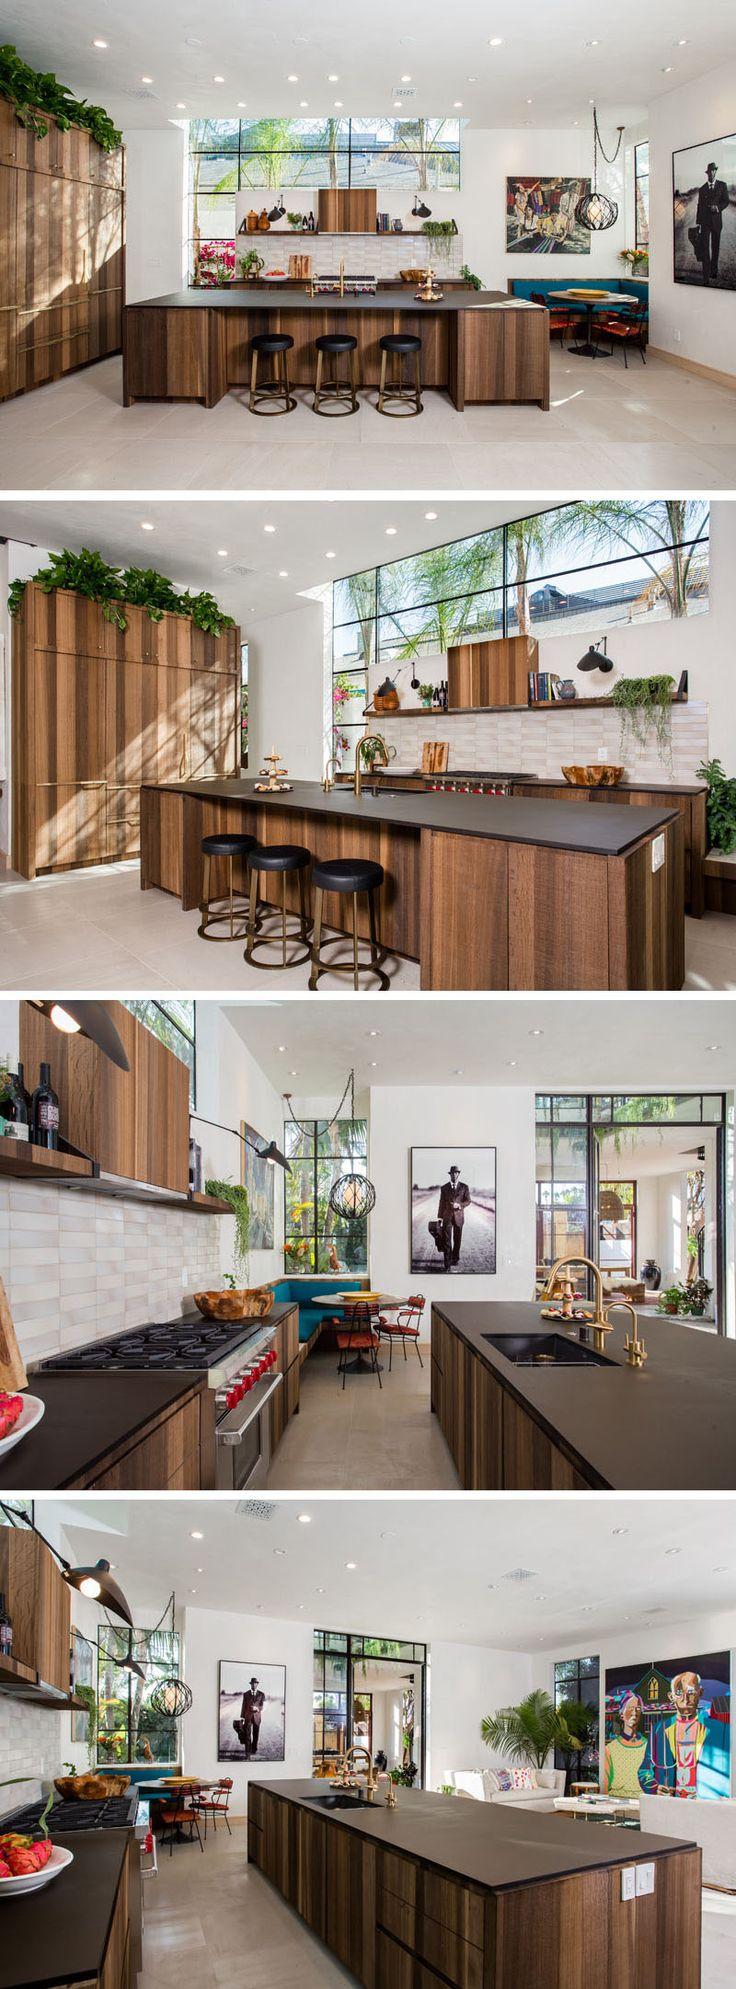 69 best ♢ NEUE MÖBEL ♢ images on Pinterest   New furniture, Sofas ...